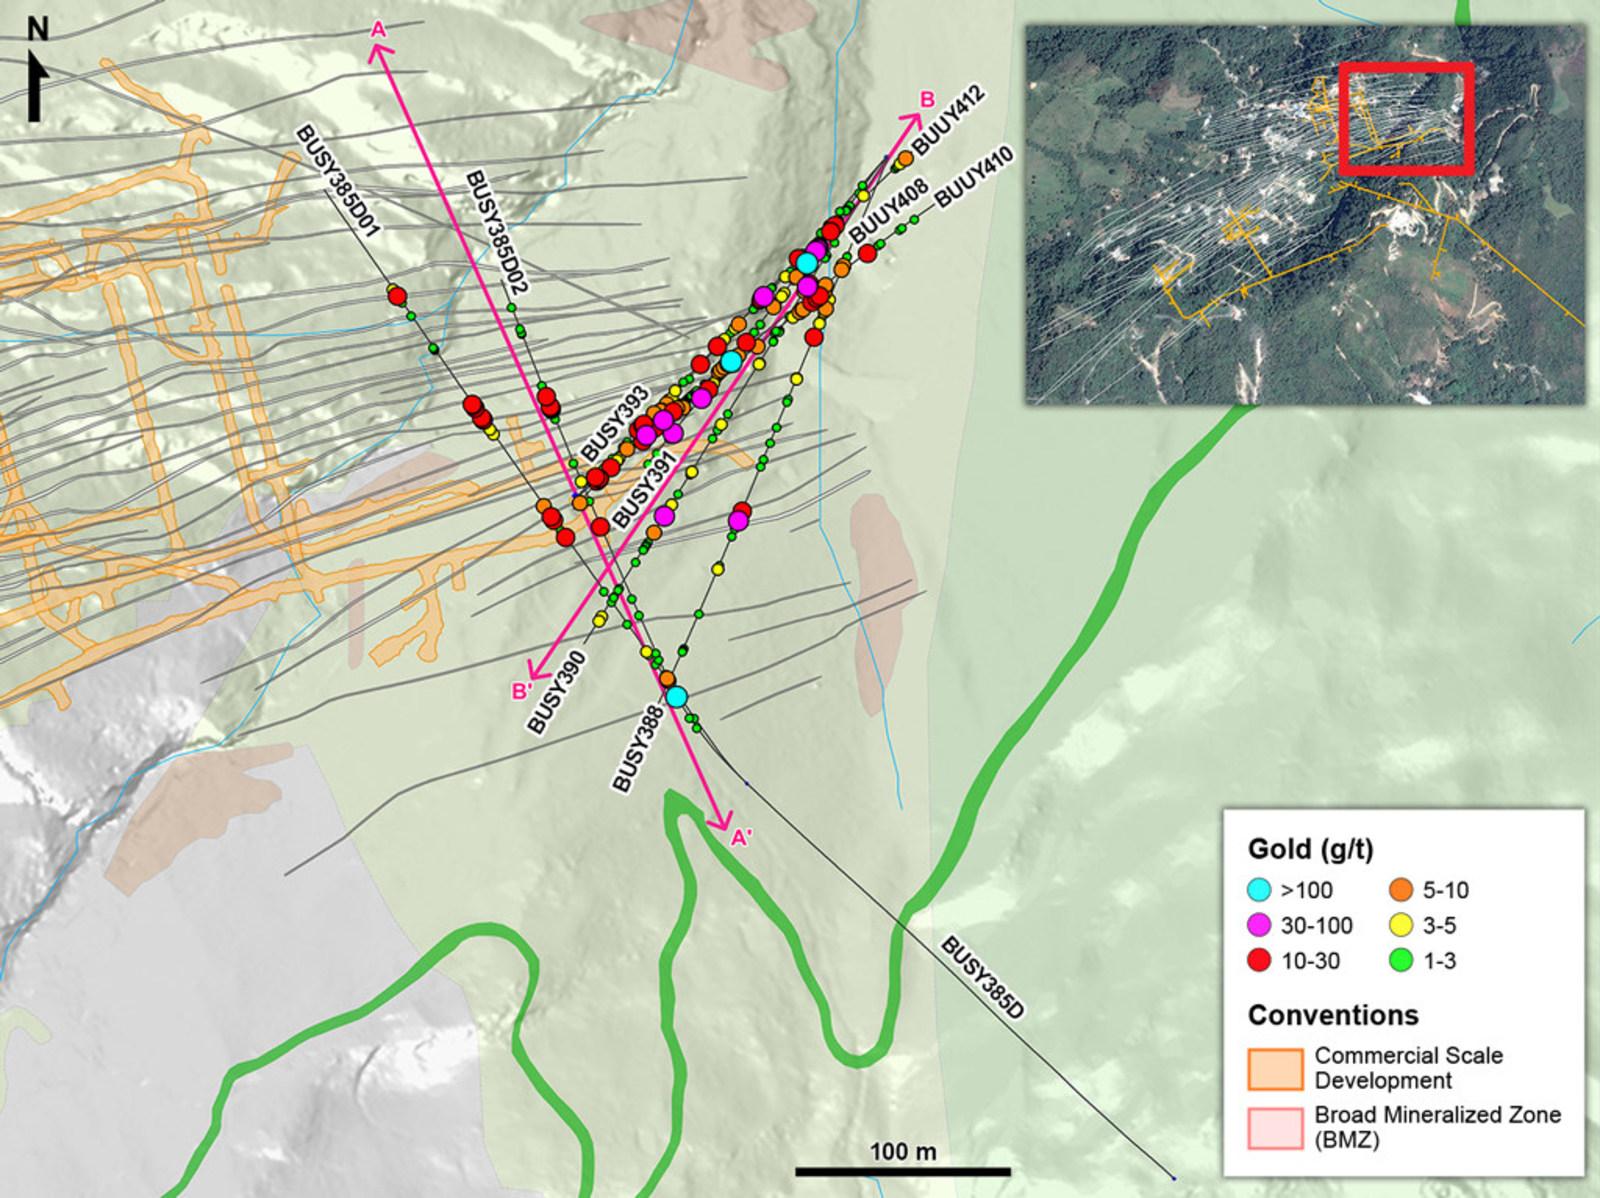 Figure 1 – Plan View of Drilling in Eastern Yaraguá vein system